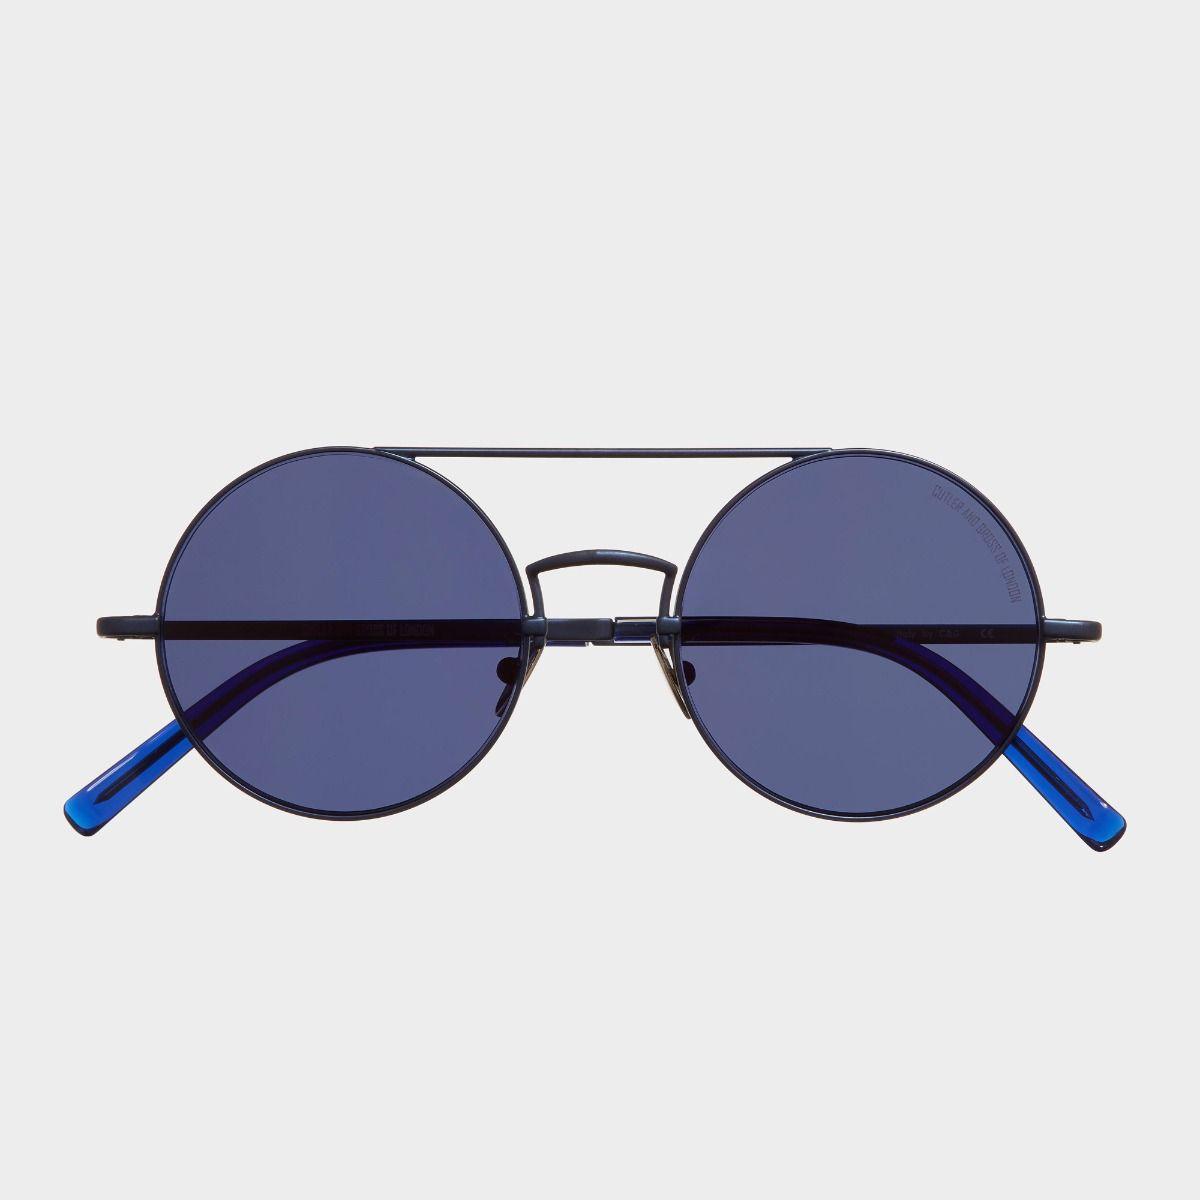 1276 Round Sunglasses